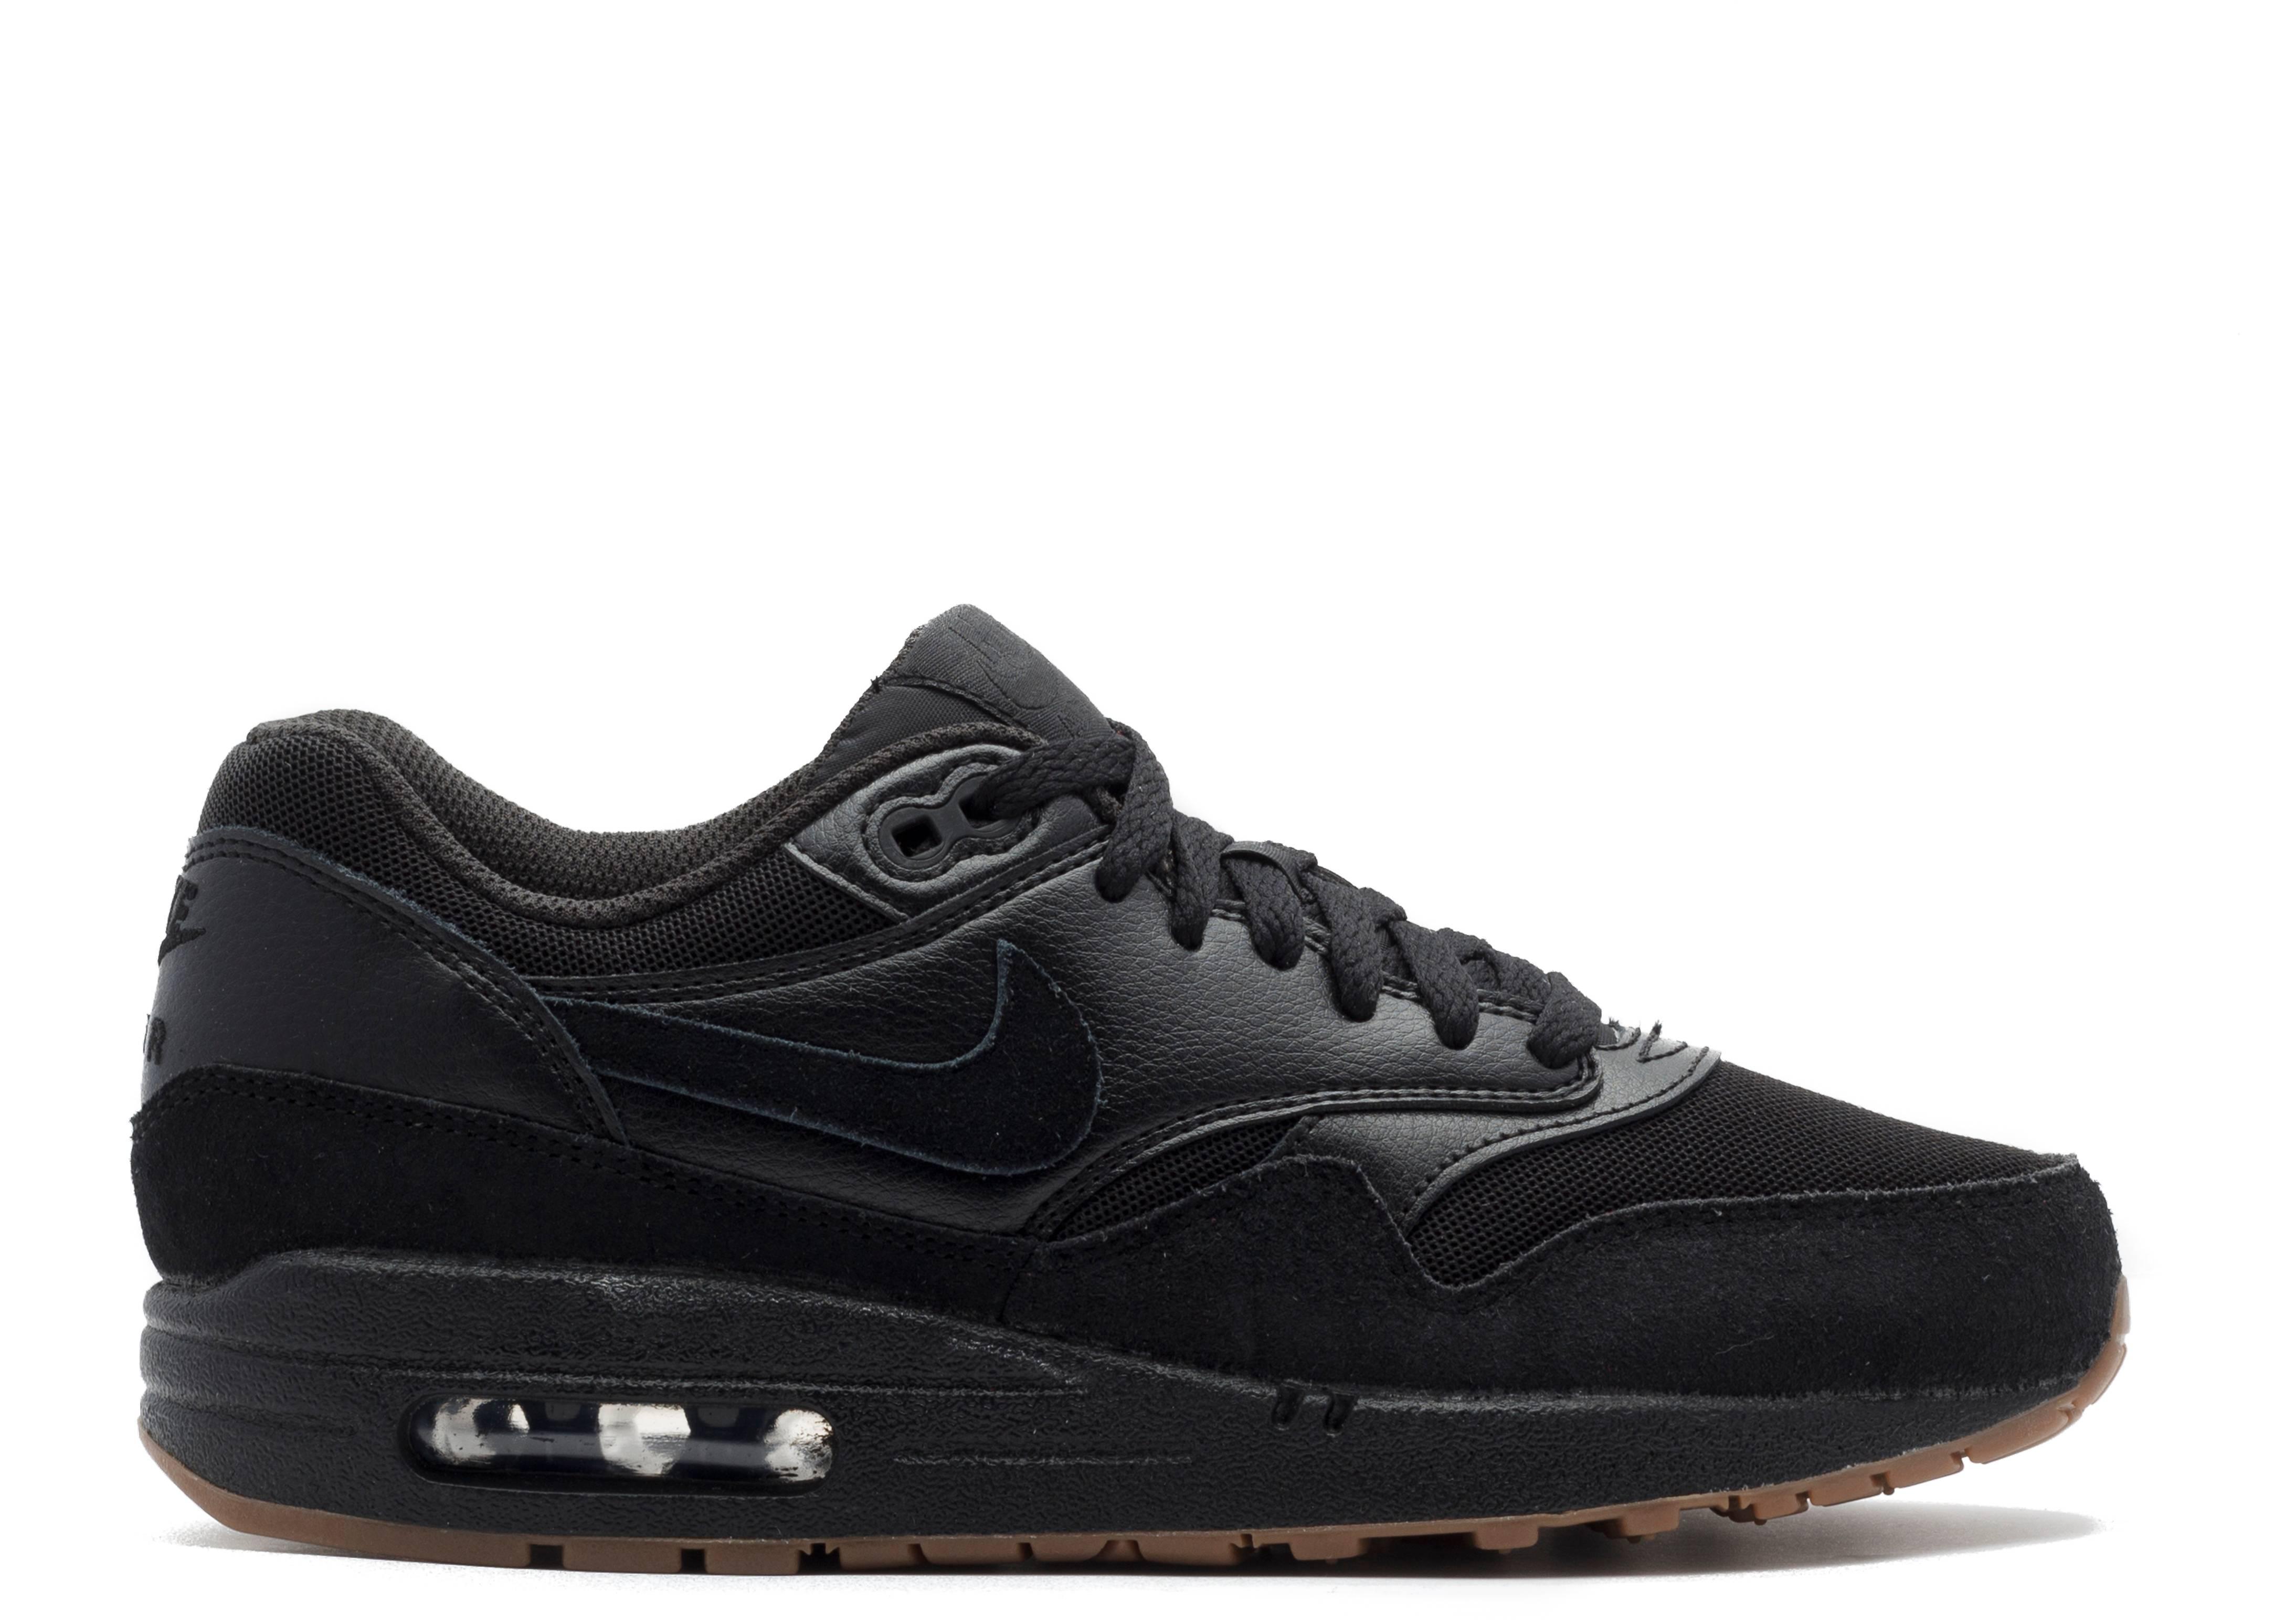 Nike Air Max 1 Essential Damen Schuhe 599820 015